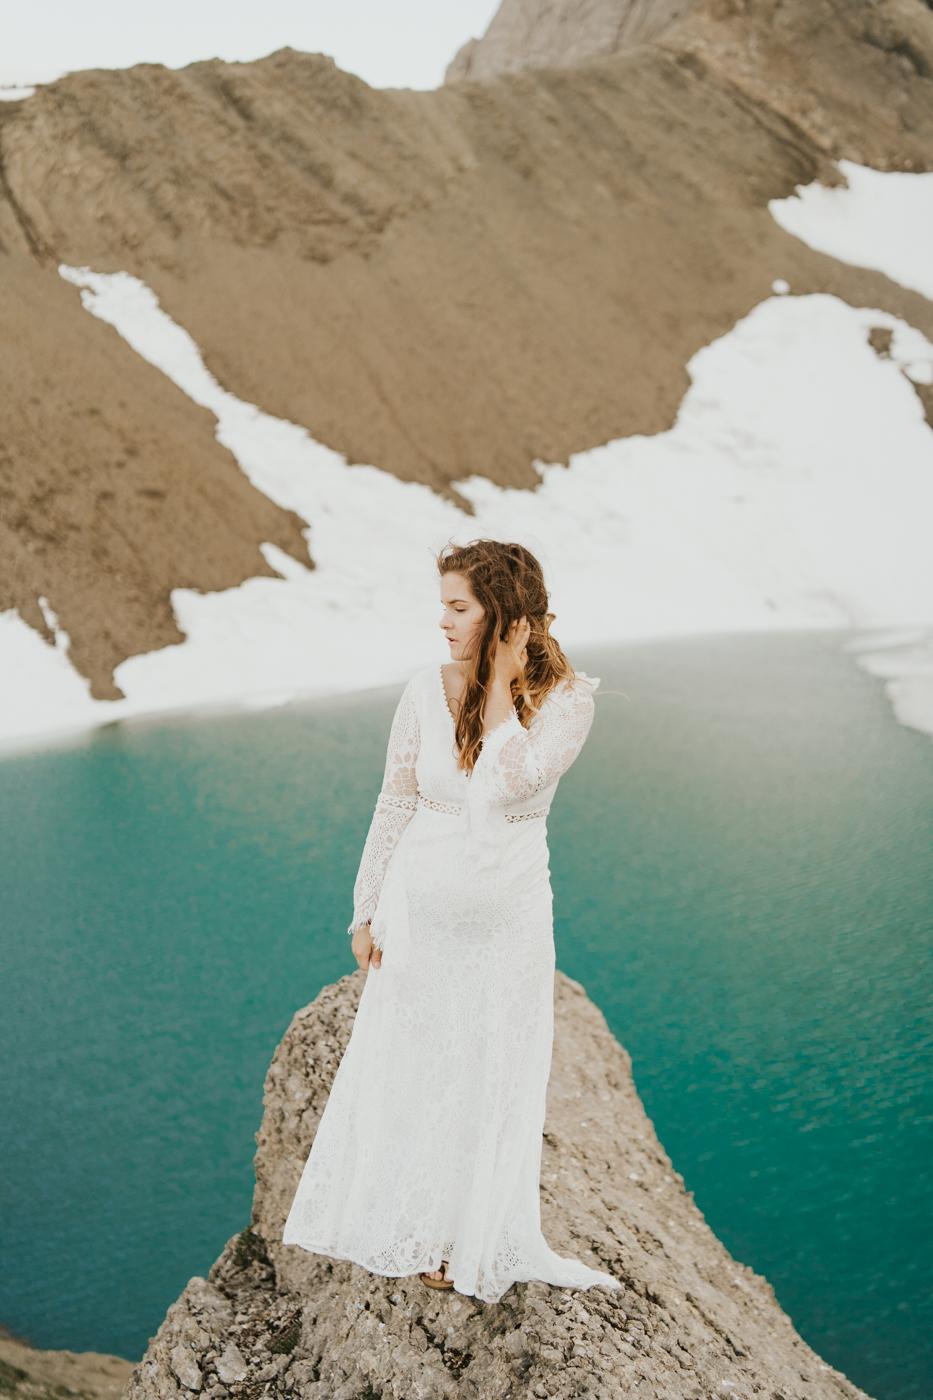 tyraephotography_photographer_wedding_elopement_engagement_photography-07871.jpg